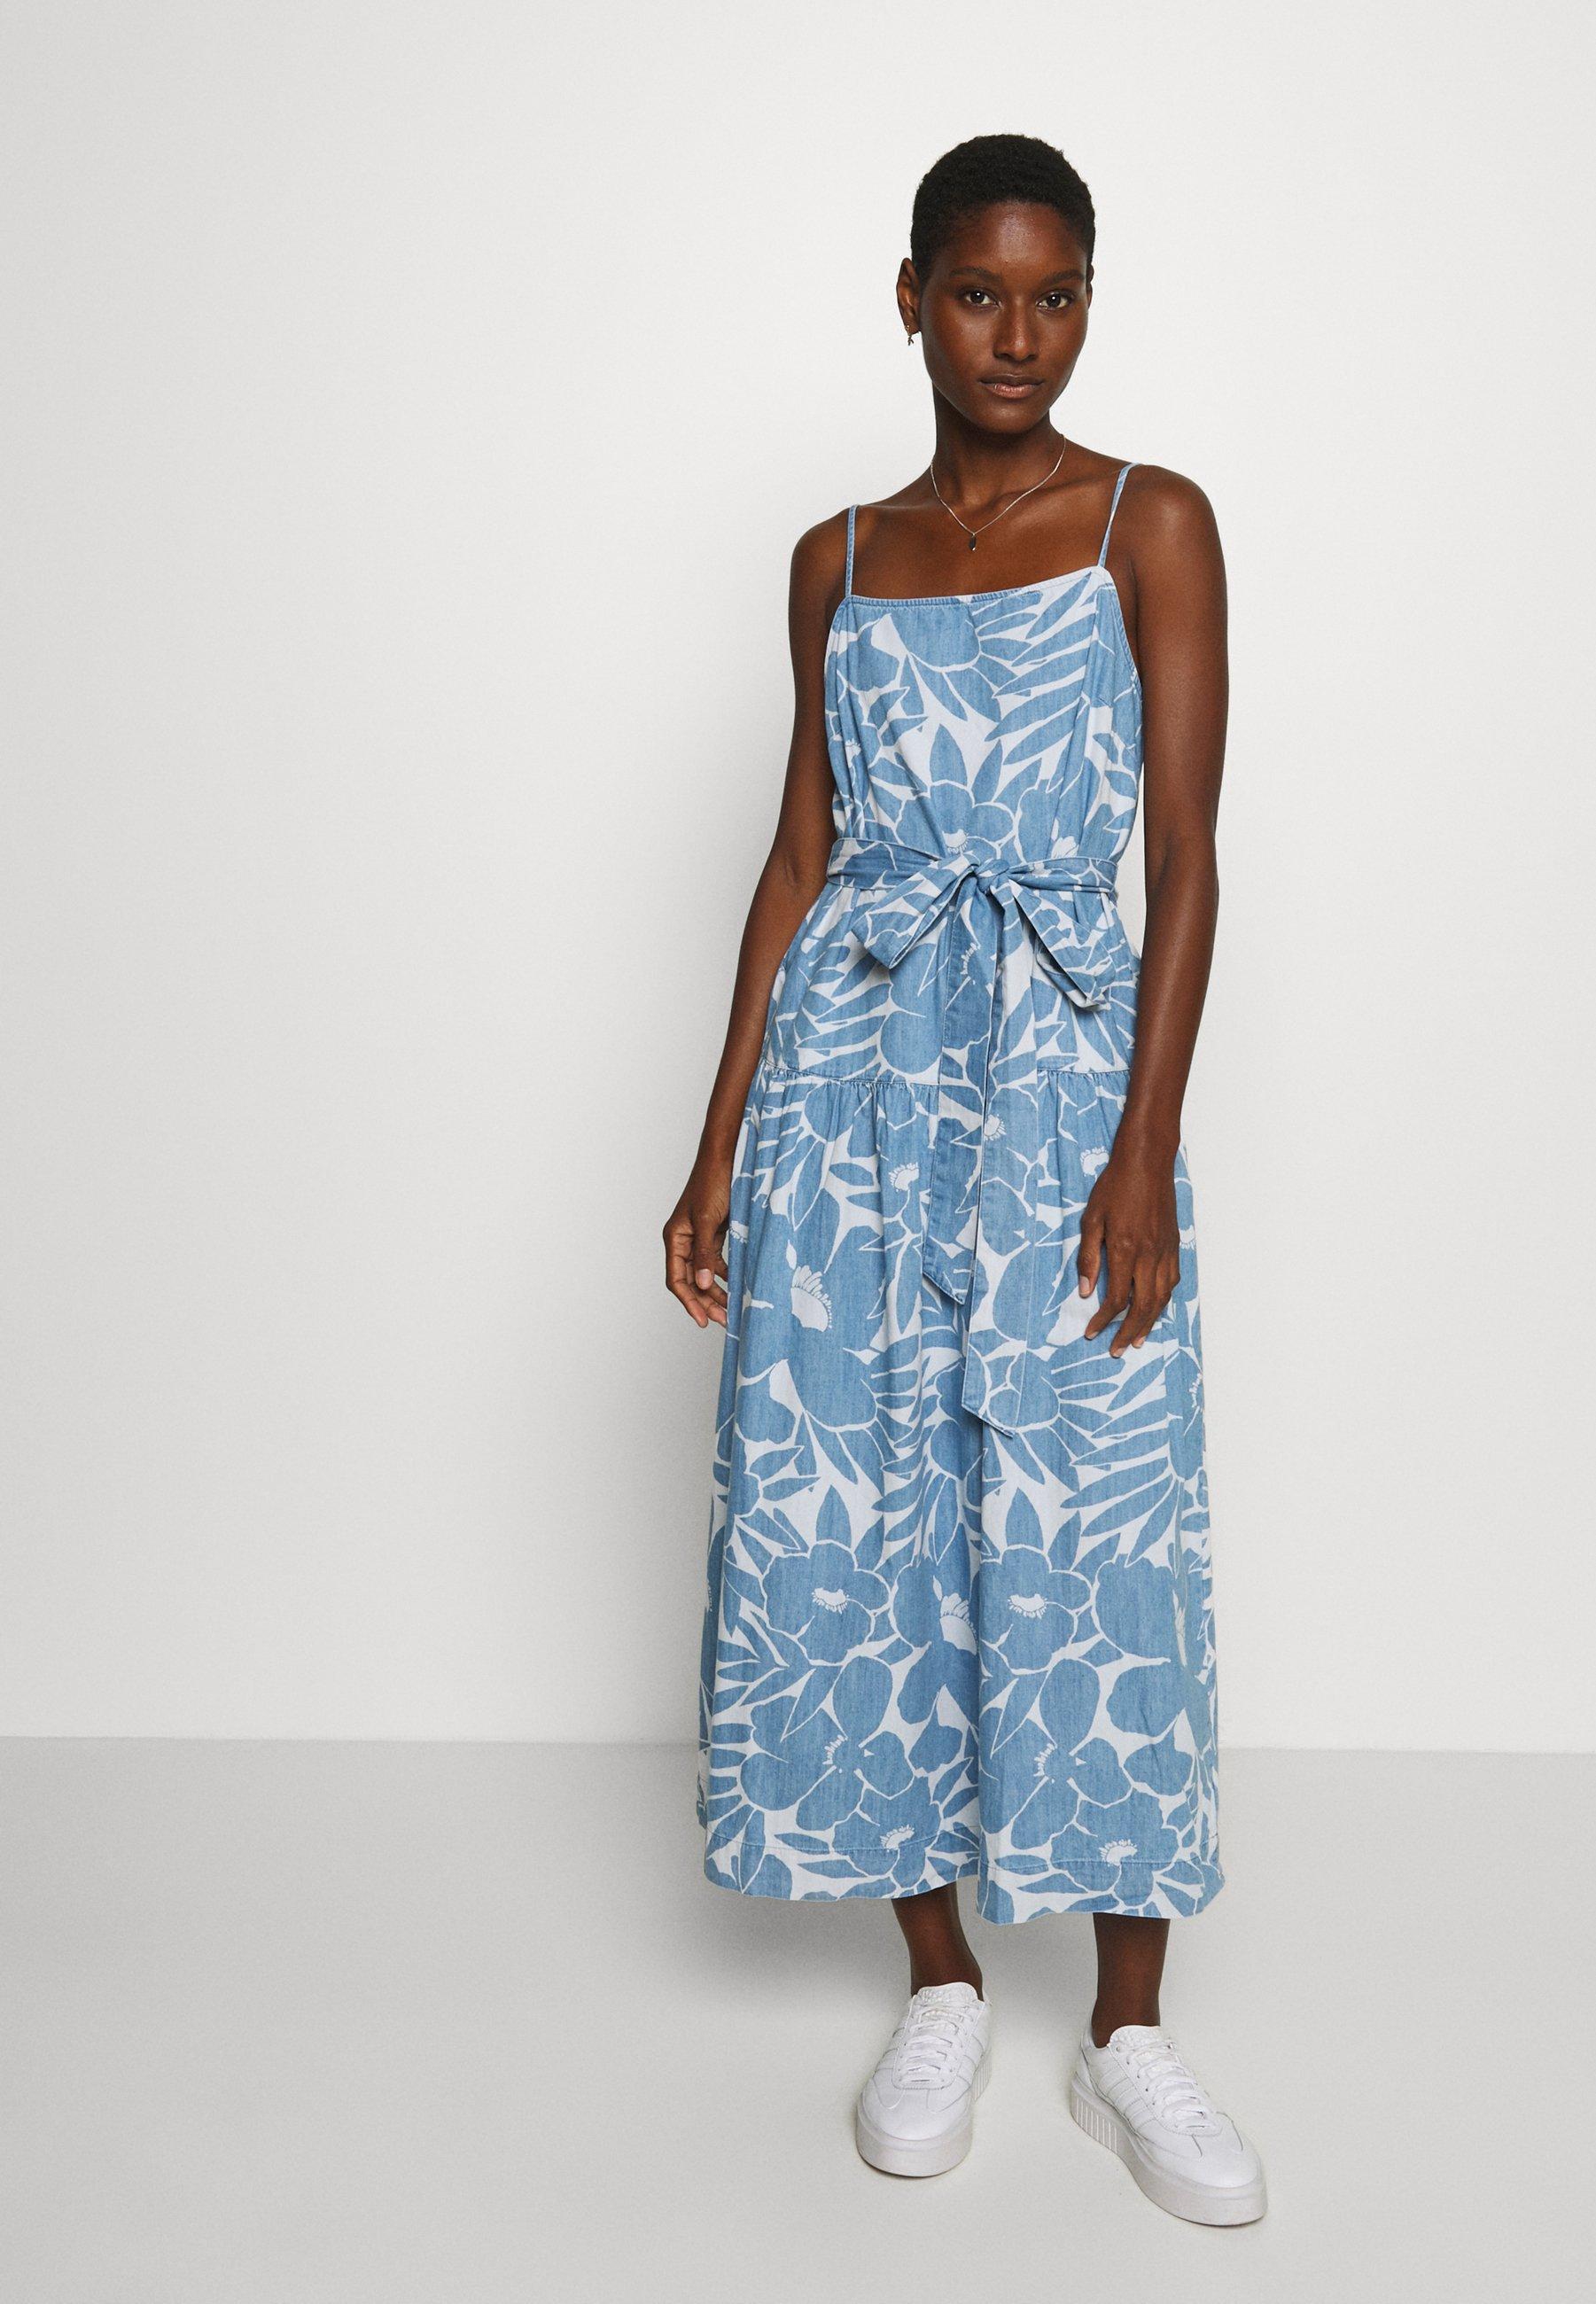 Mode-Stijl Best Verkopende Dameskleding sdkjGX55lghisd GAP APRON TIE WEST DRESS Spijkerjurk blue vsEa1qM